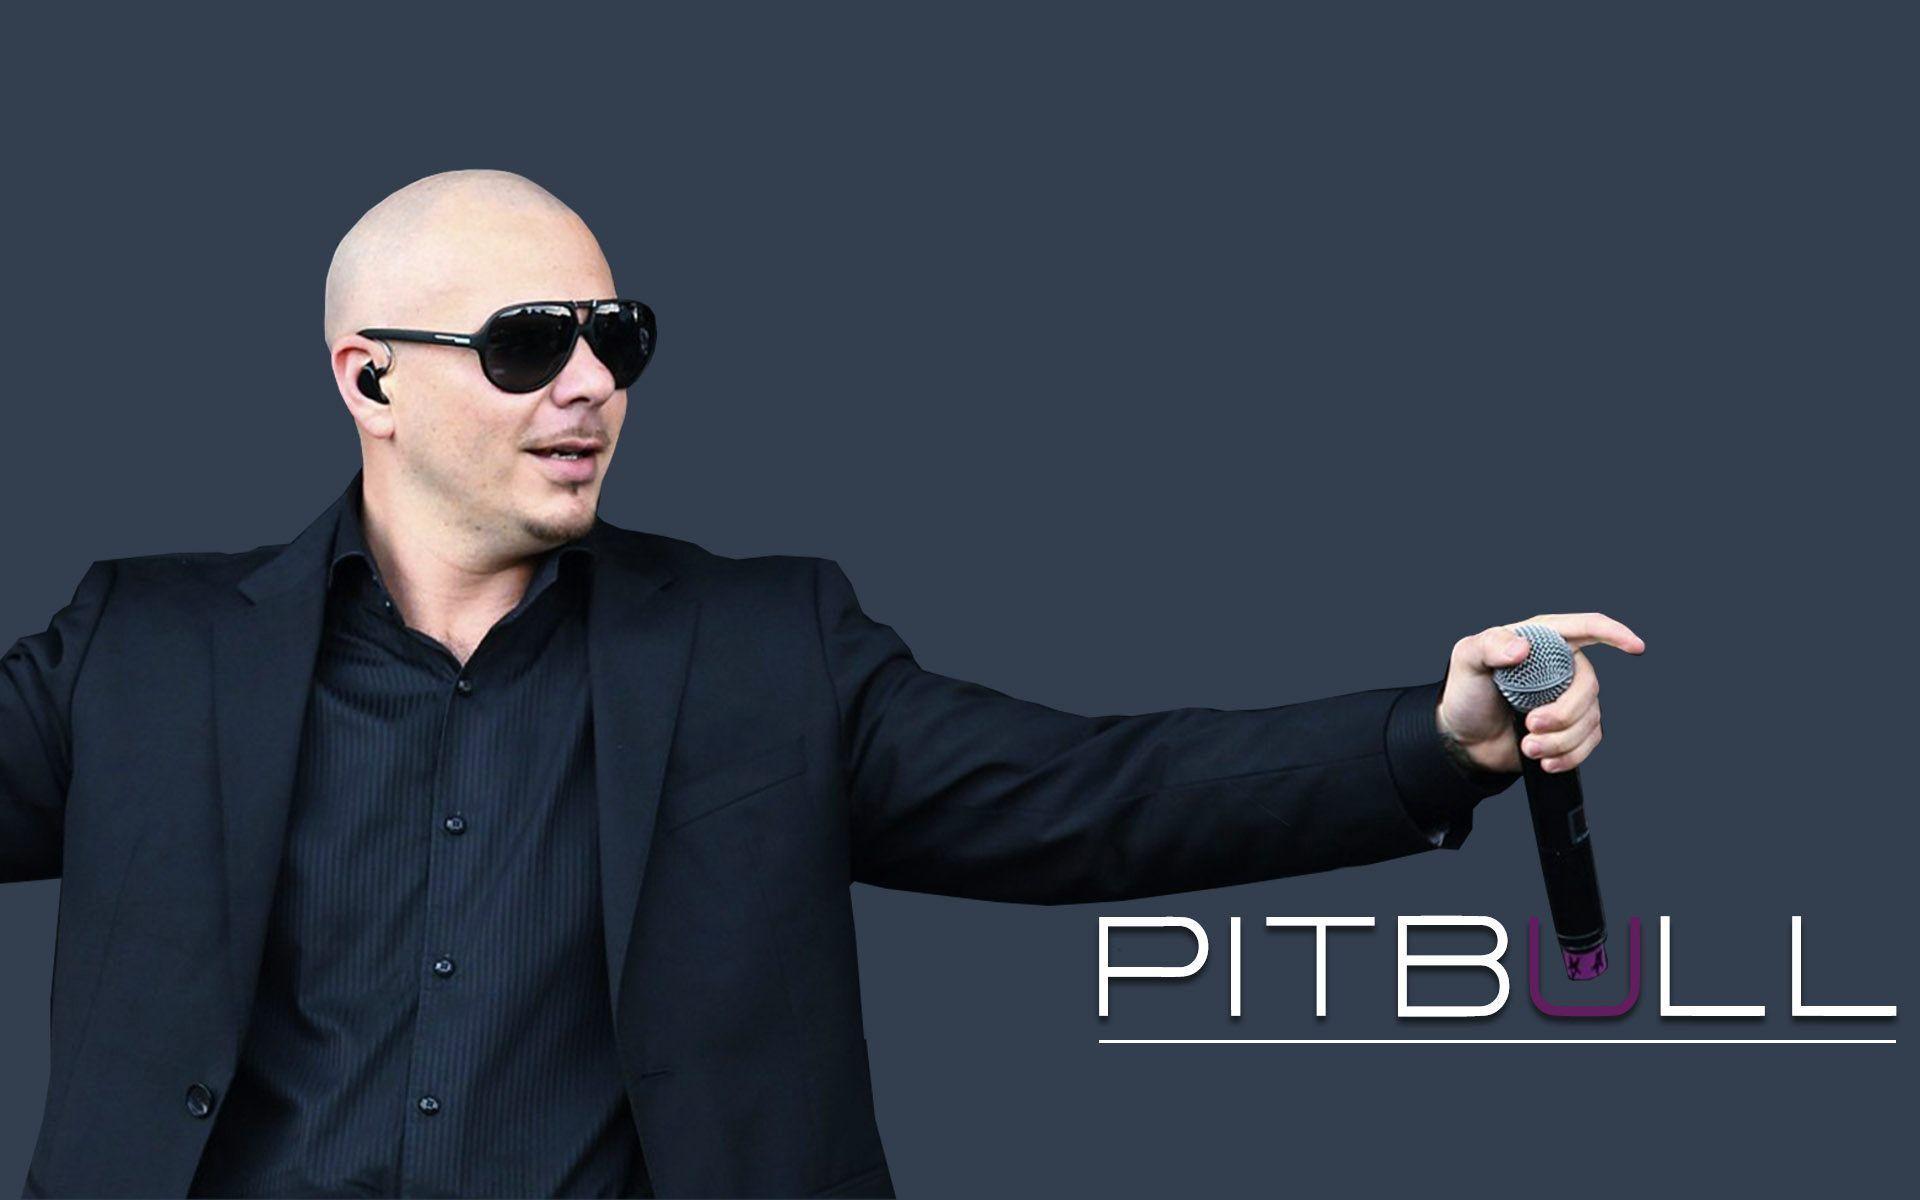 Pitbull Rapper Wallpapers - Top Free Pitbull Rapper